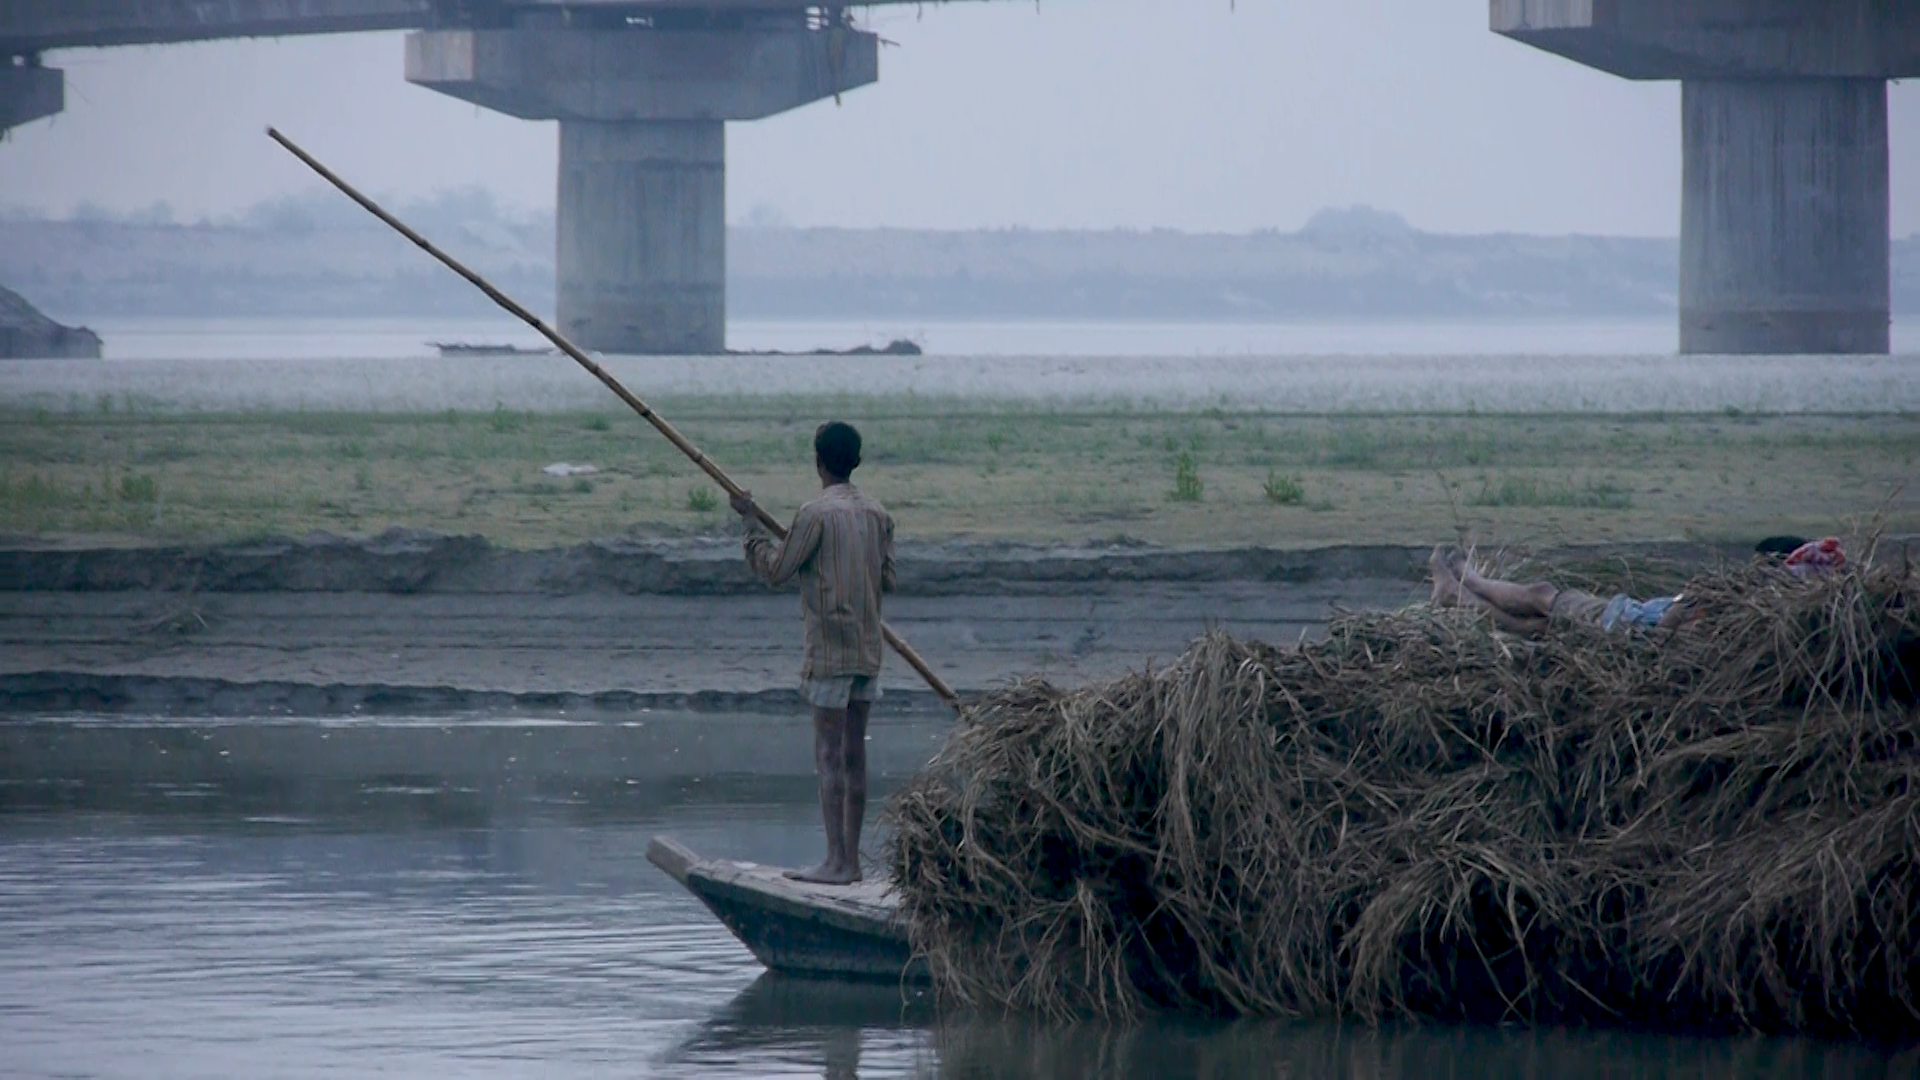 Sugar cane barge, Bihar, India